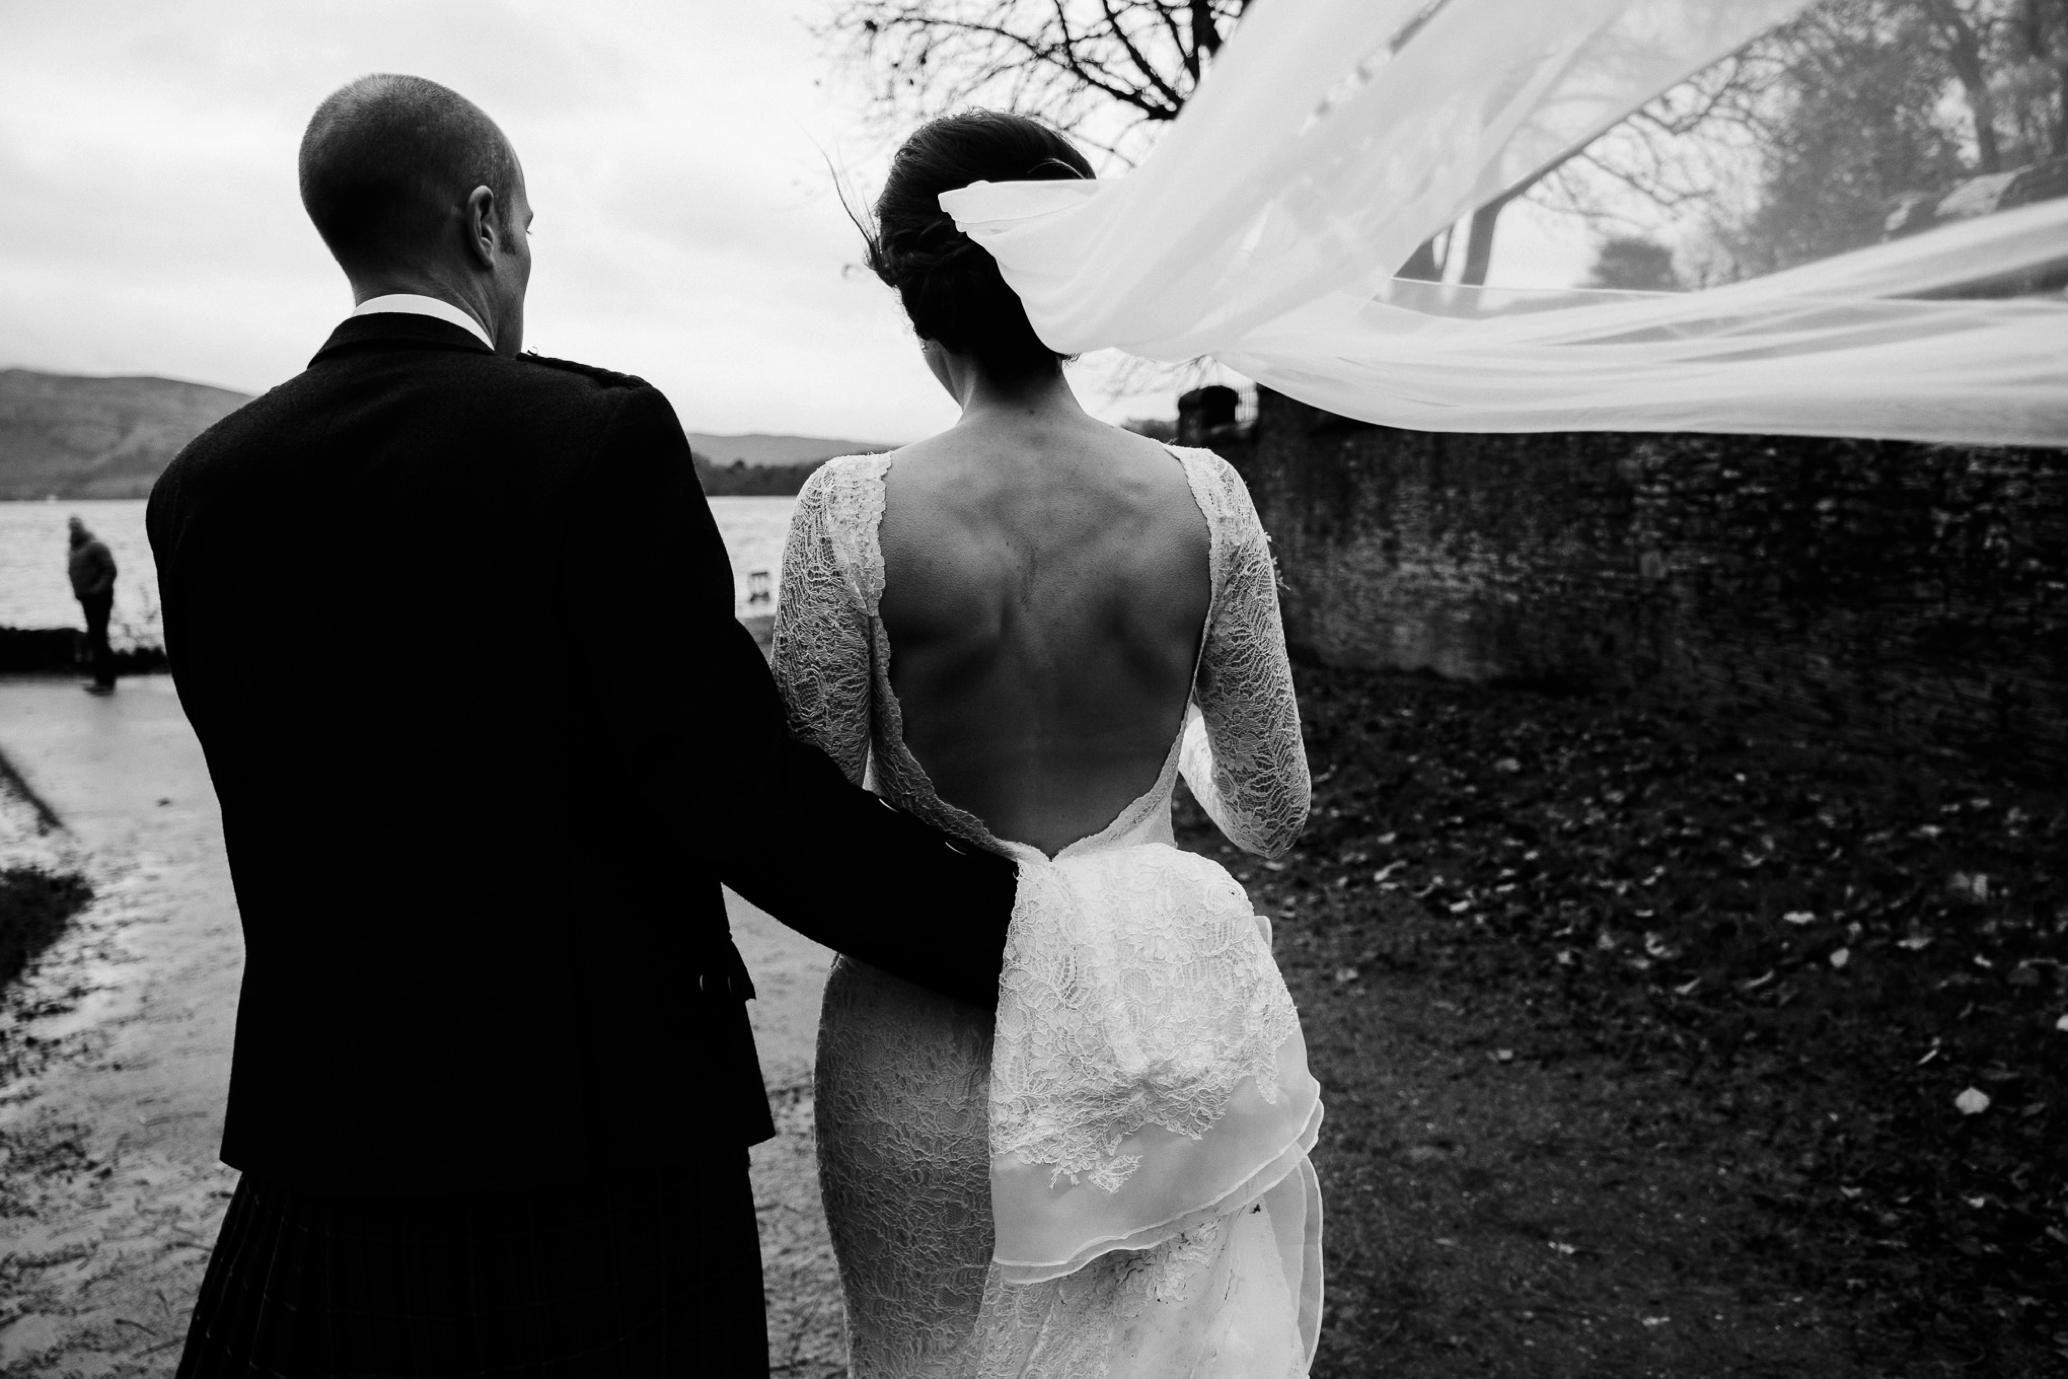 20171021_euan robertson weddings_070_WEB.jpg